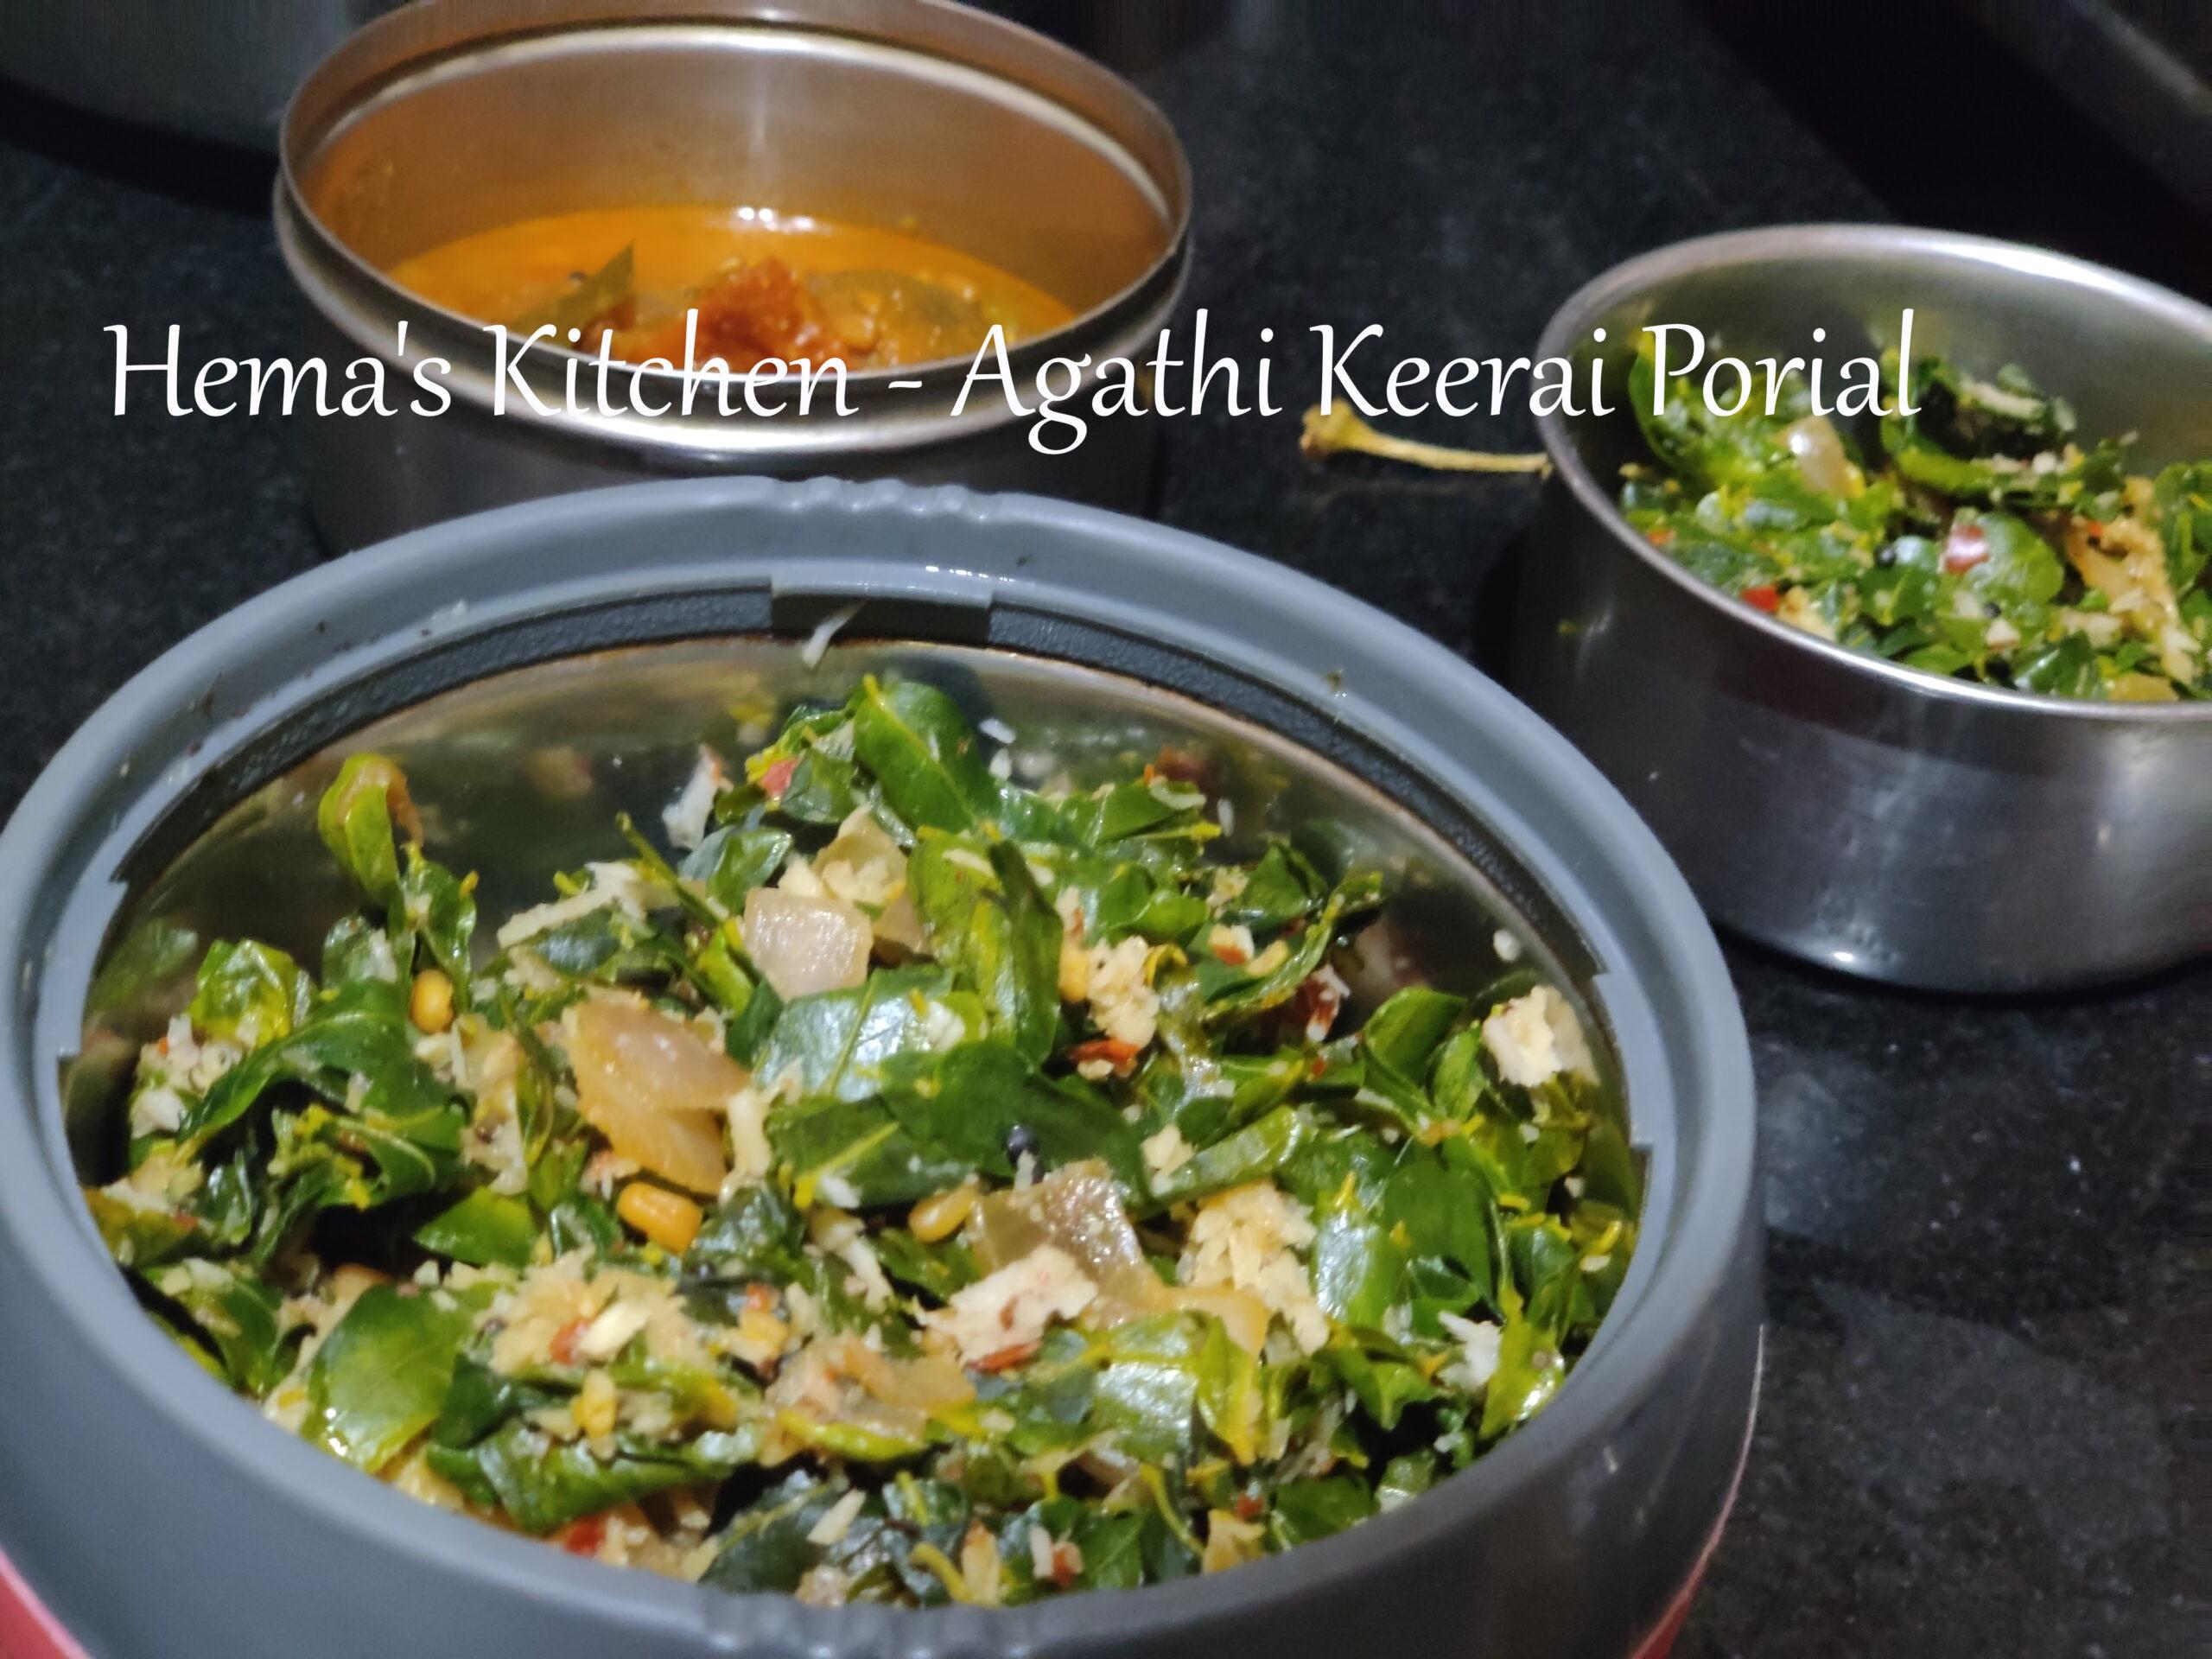 Agathi Keerai Porial